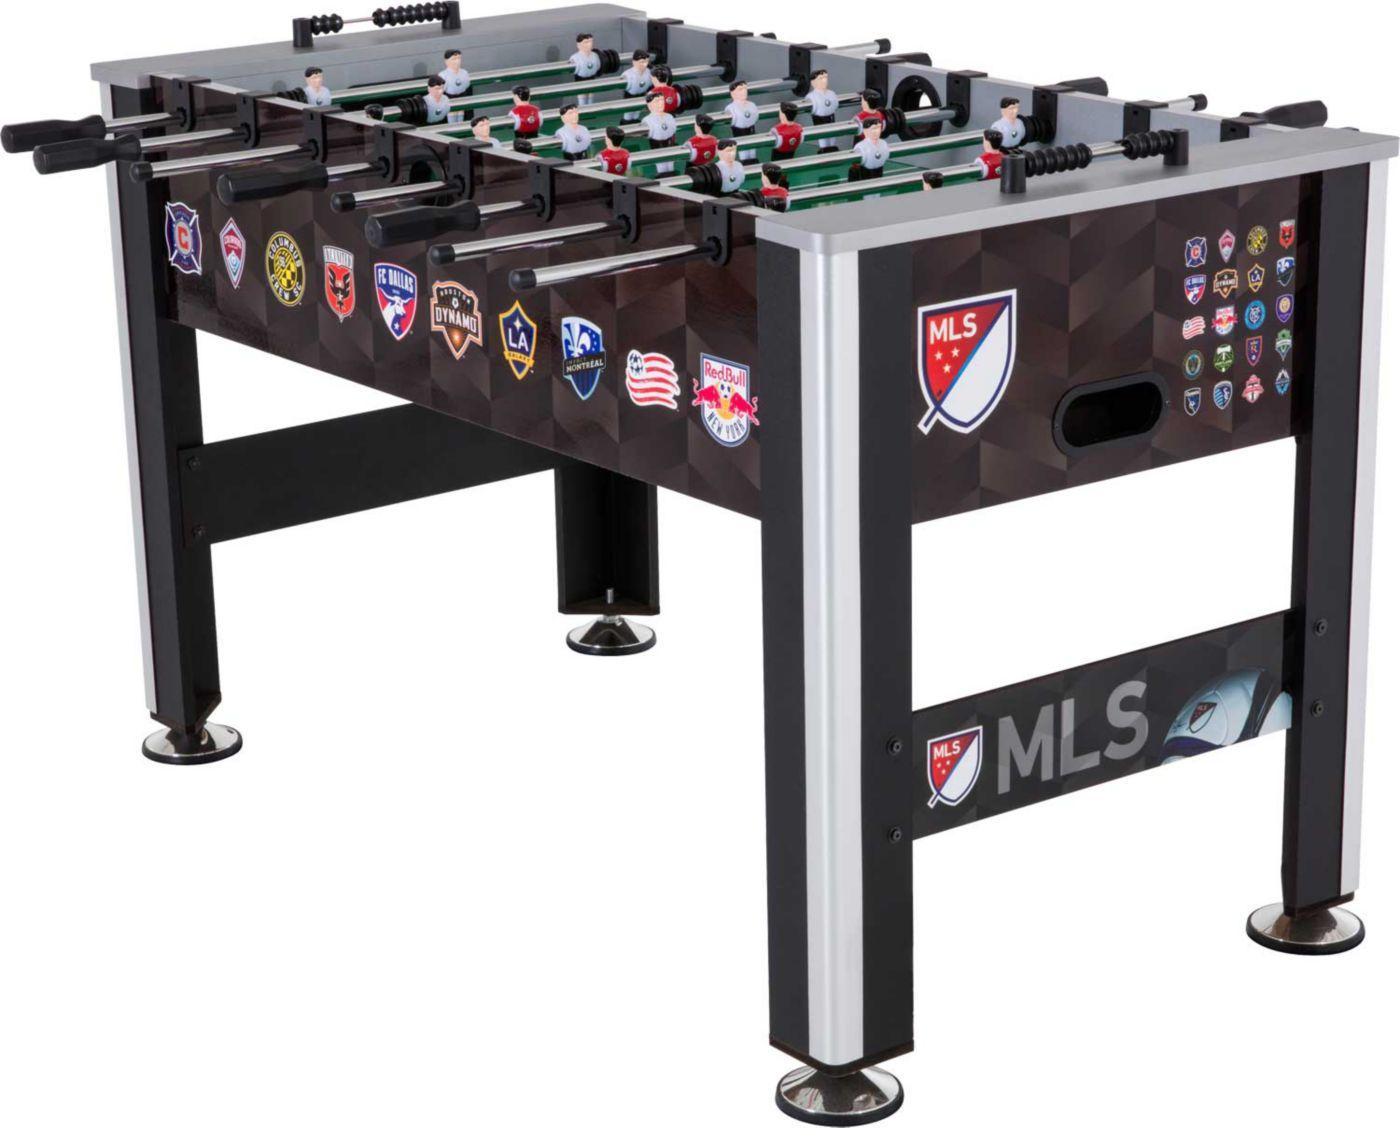 "Triumph Breakaway 55"" MLS Foosball Table"